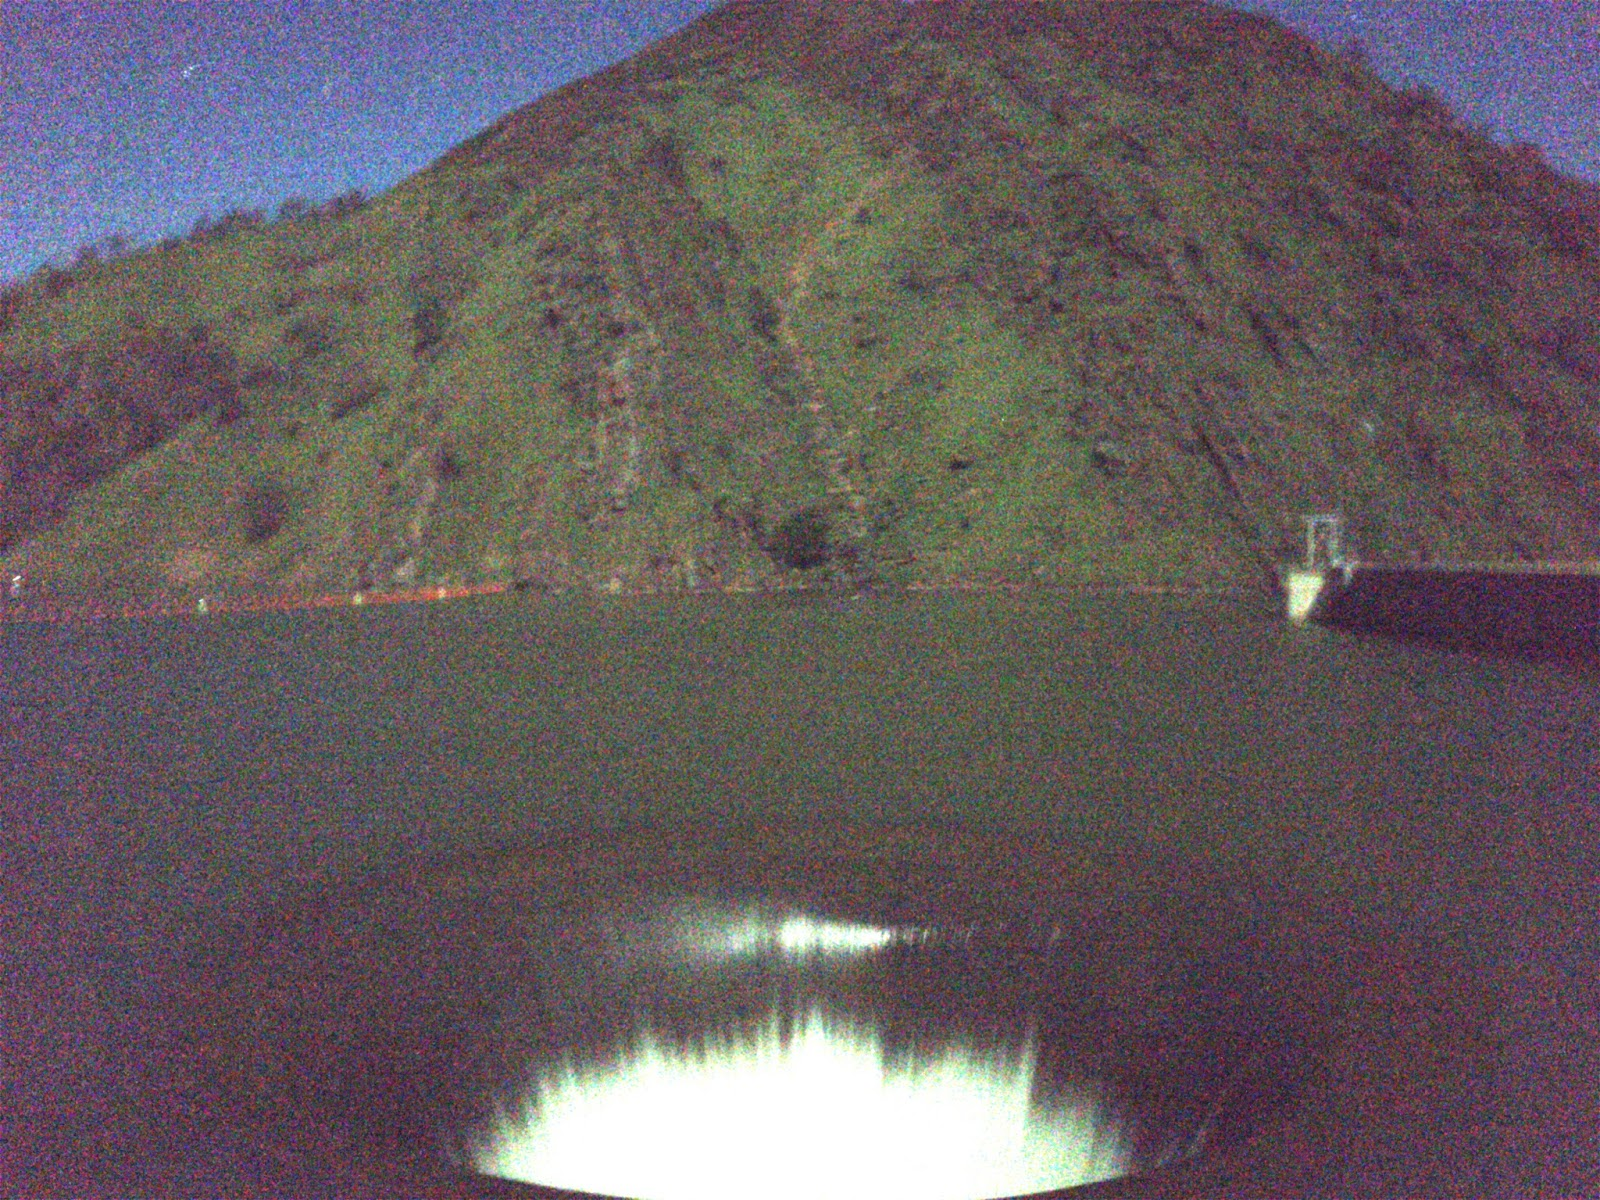 Moto: Lake Berryessa Monticello Dam Glory Hole At Night